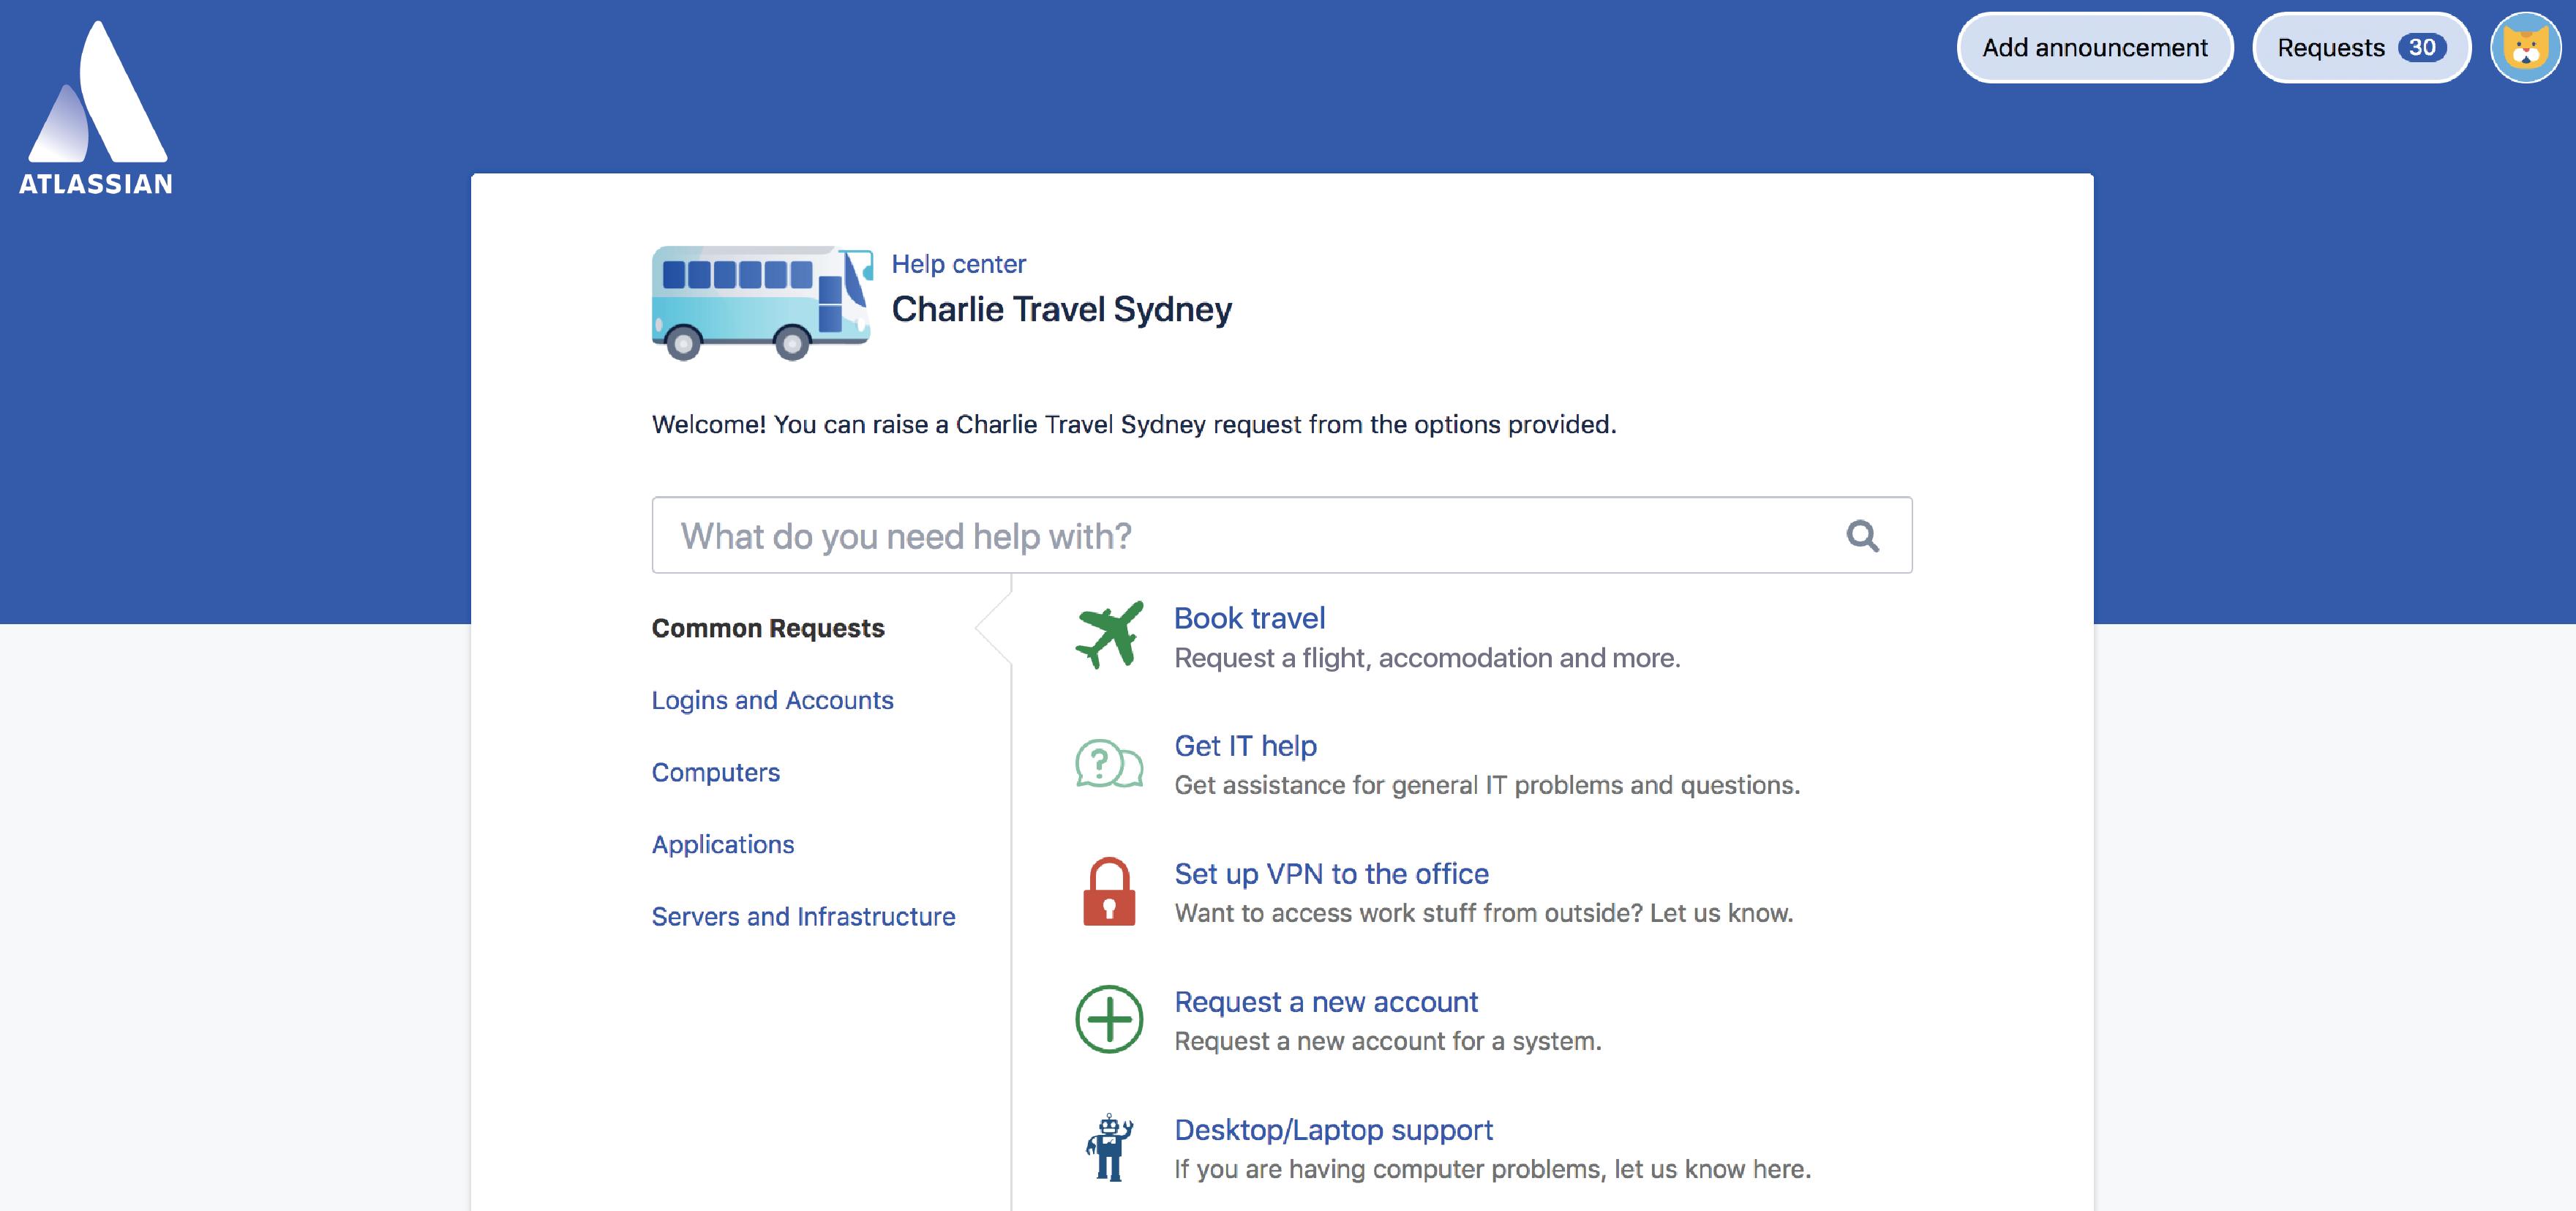 Charlie Travel Sydney プロジェクトのカスタマー ポータル。